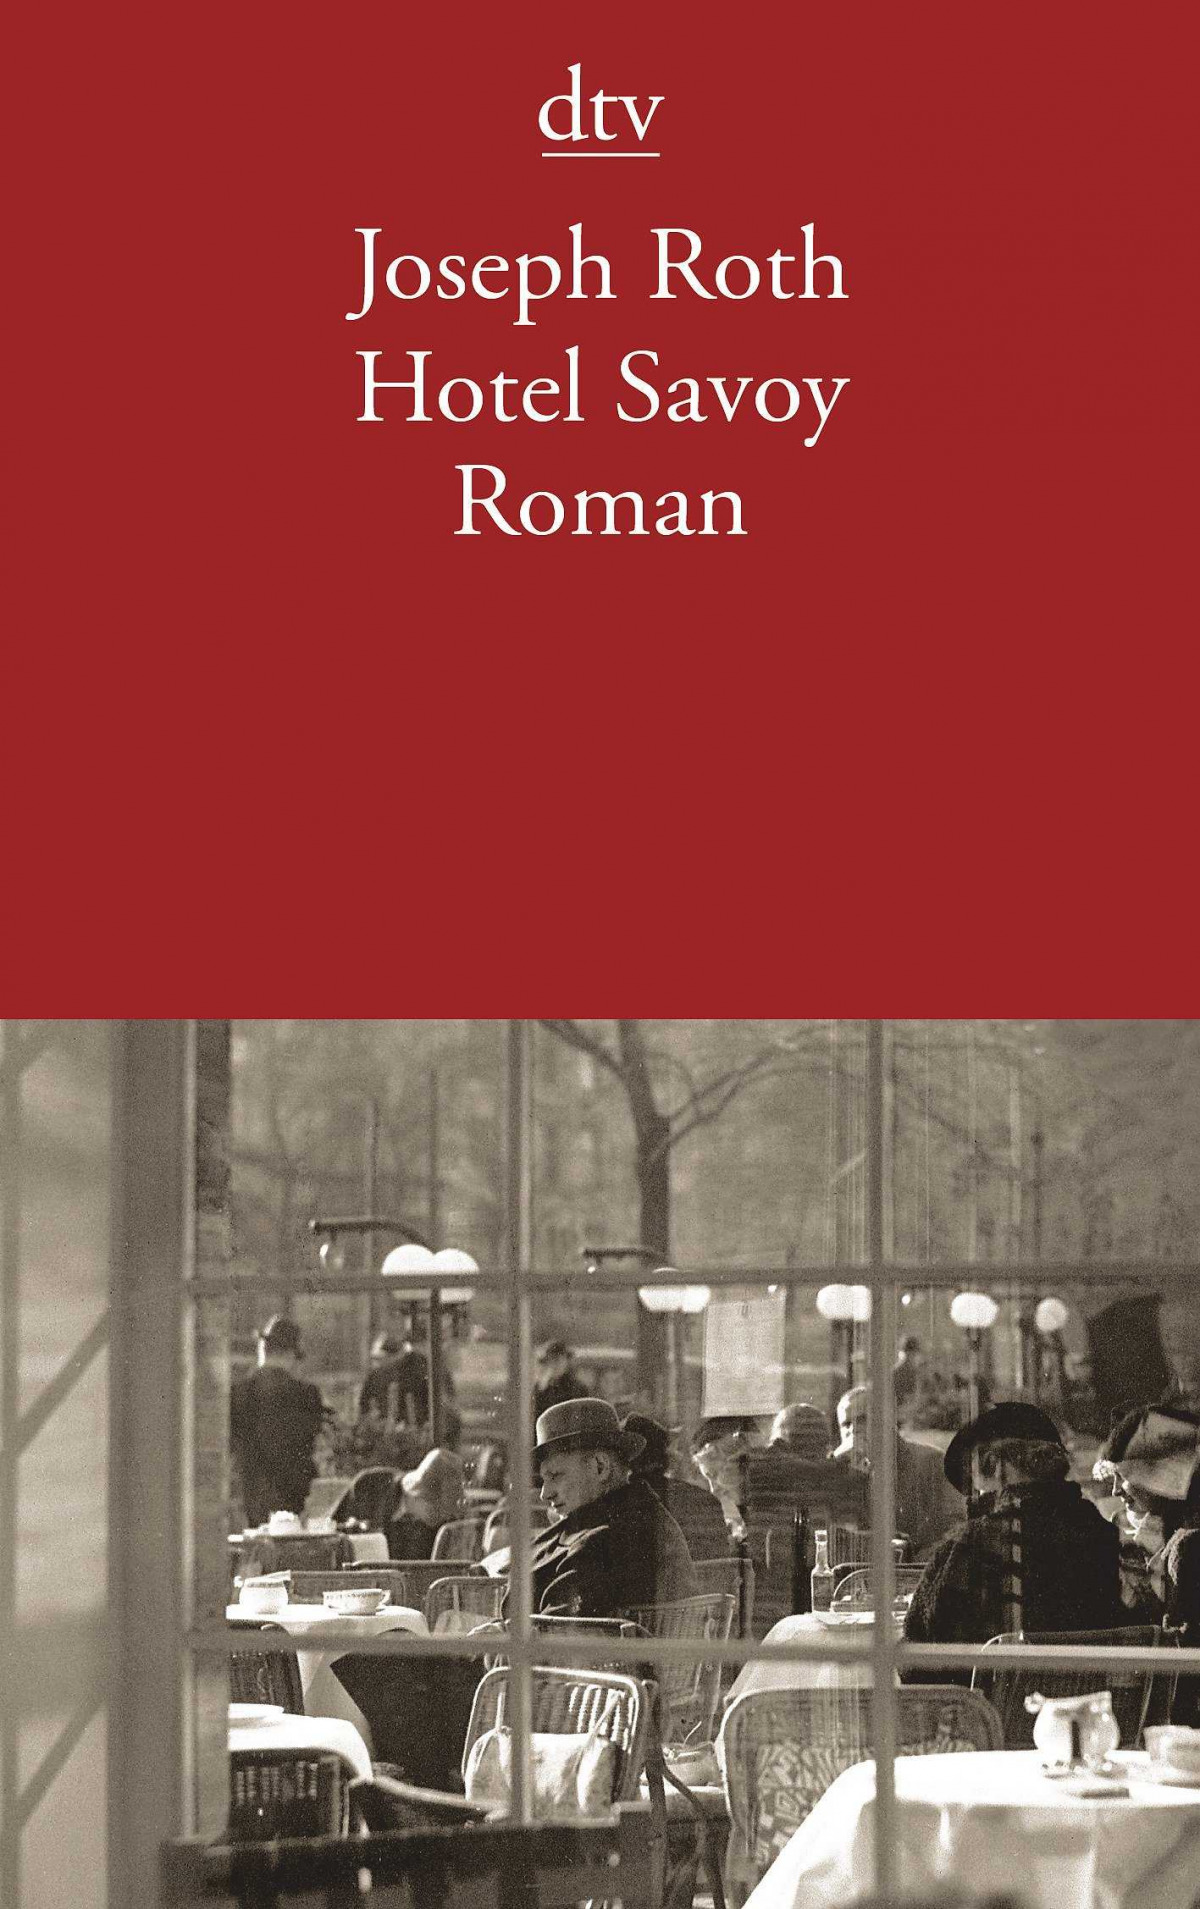 HOTEL SAVOY: ROMAN